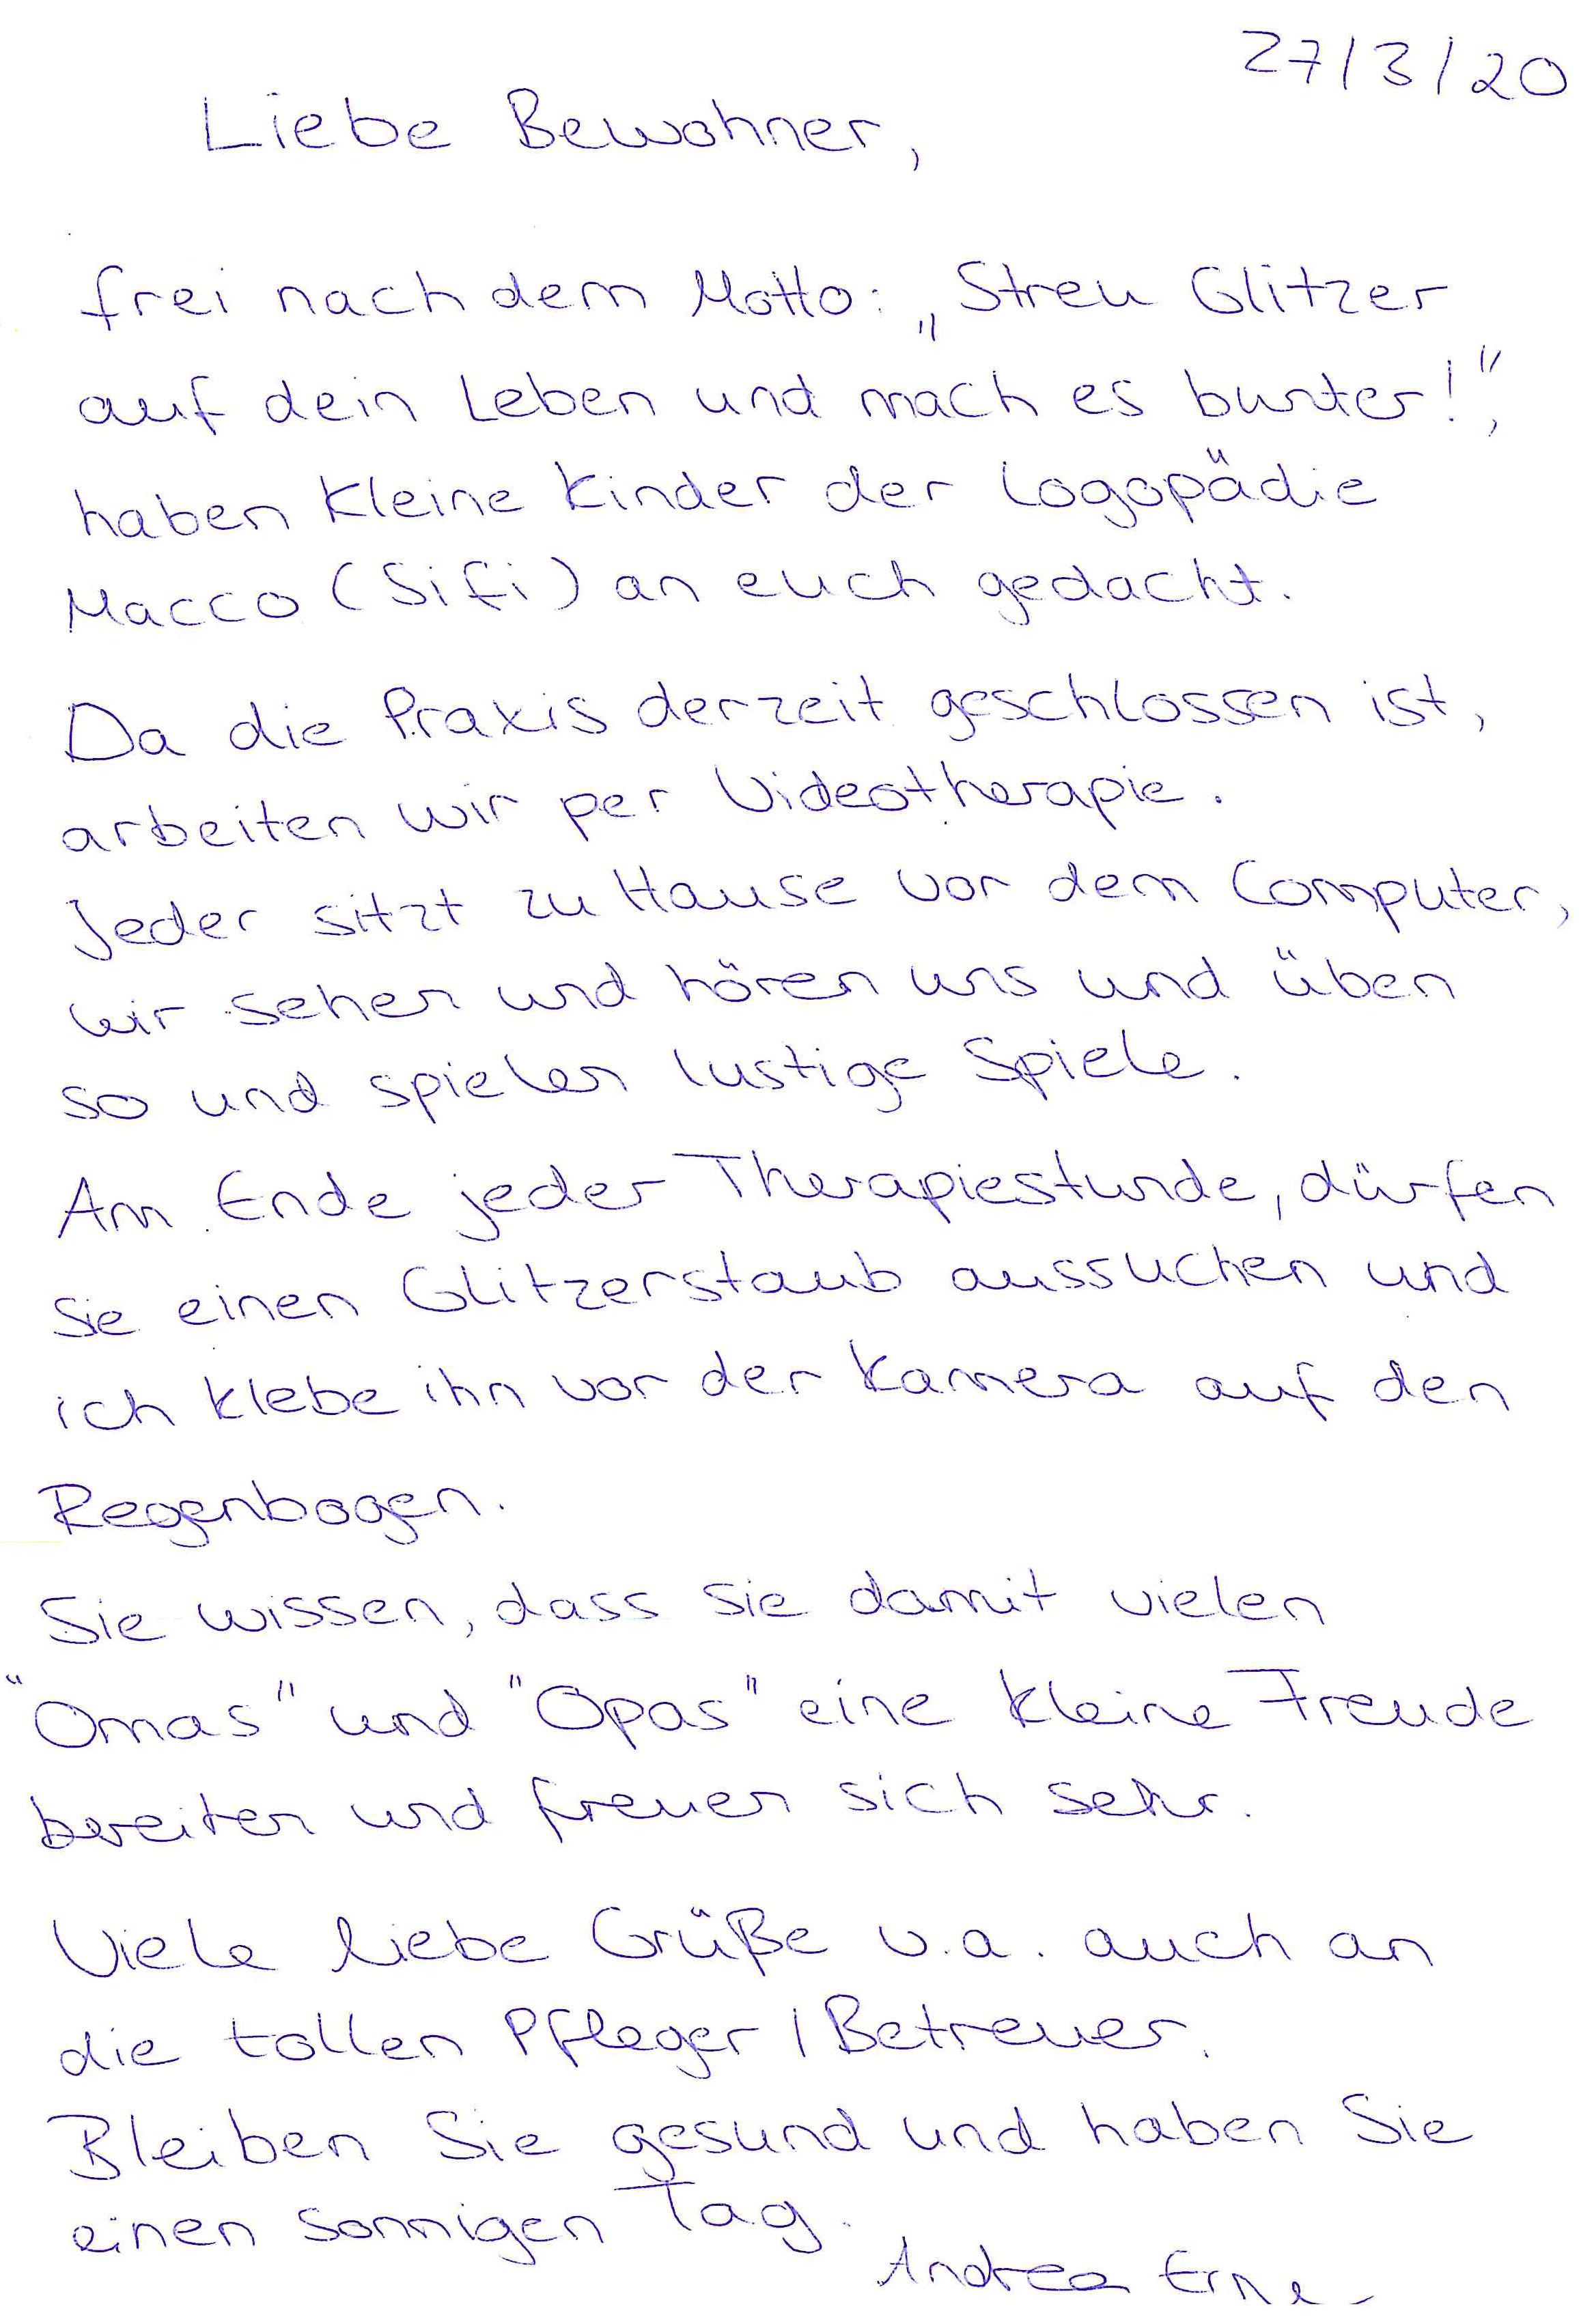 Tod danke nach an pflegepersonal Altersheim, Pflegeheim,